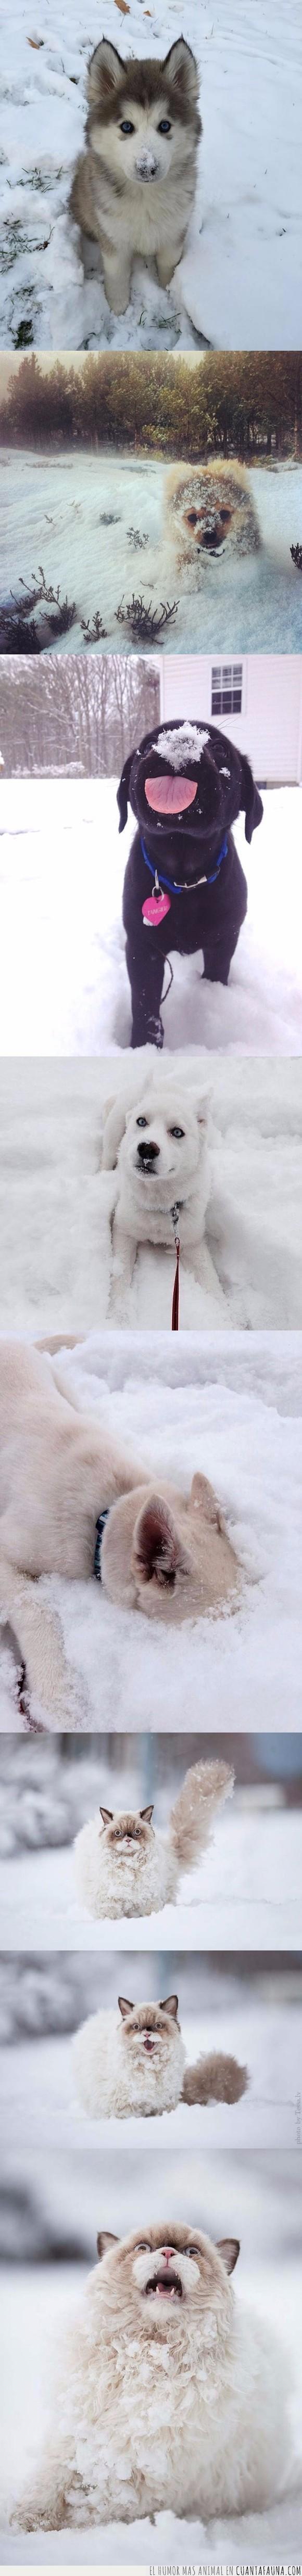 gastos,nevar,nieve,perros